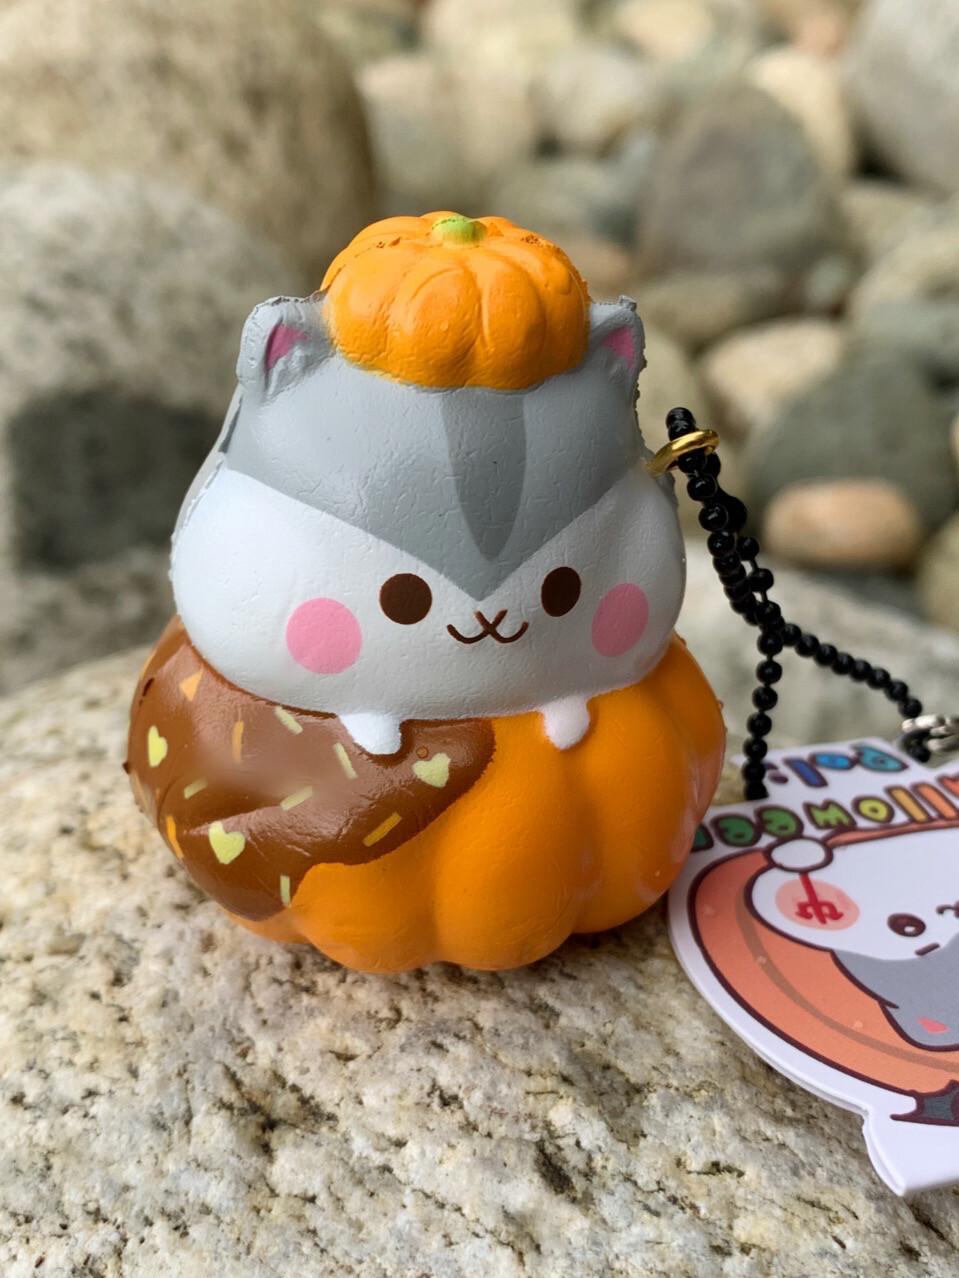 Poli Hamster Chocolate Pumpkin Squishy Toy